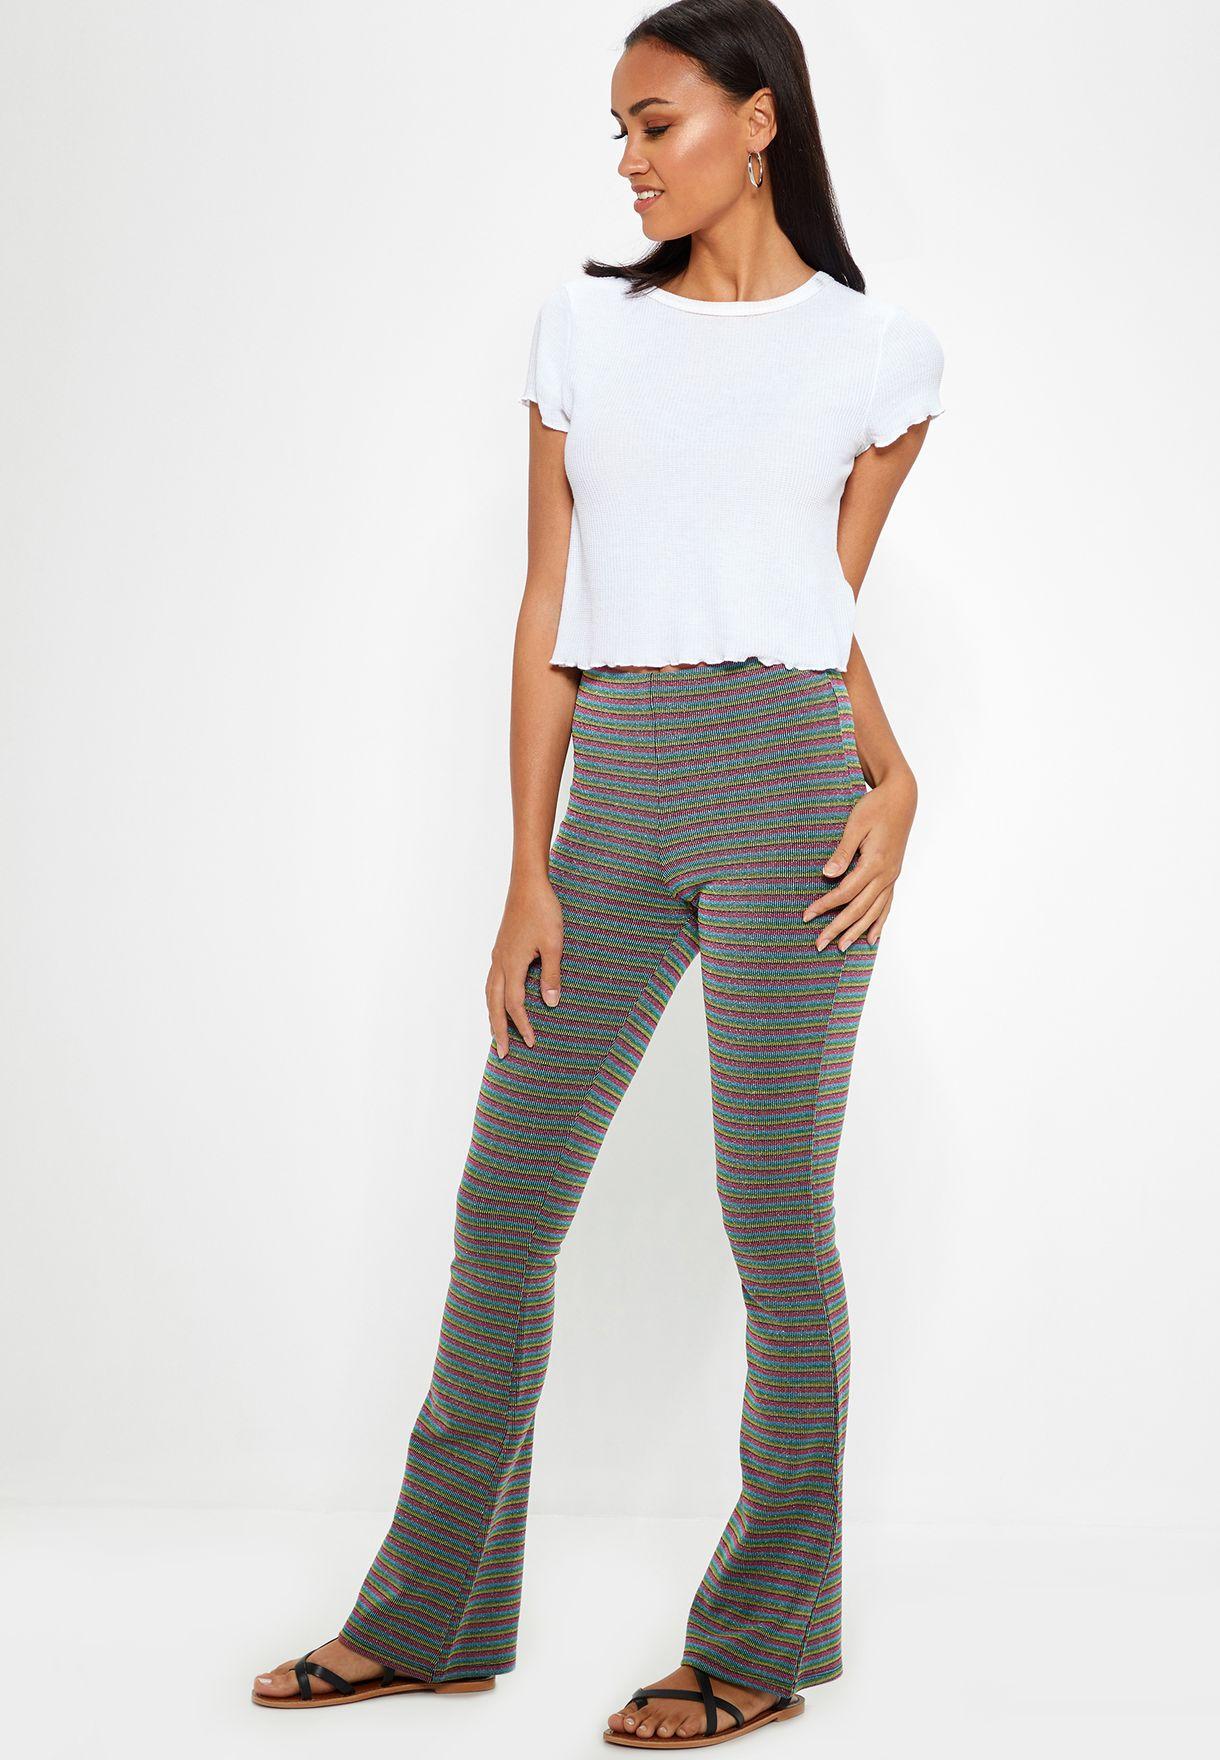 7fa8498cde1e Shop Topshop multicolor Striped Flared Pants 16F02PMUL for Women in ...